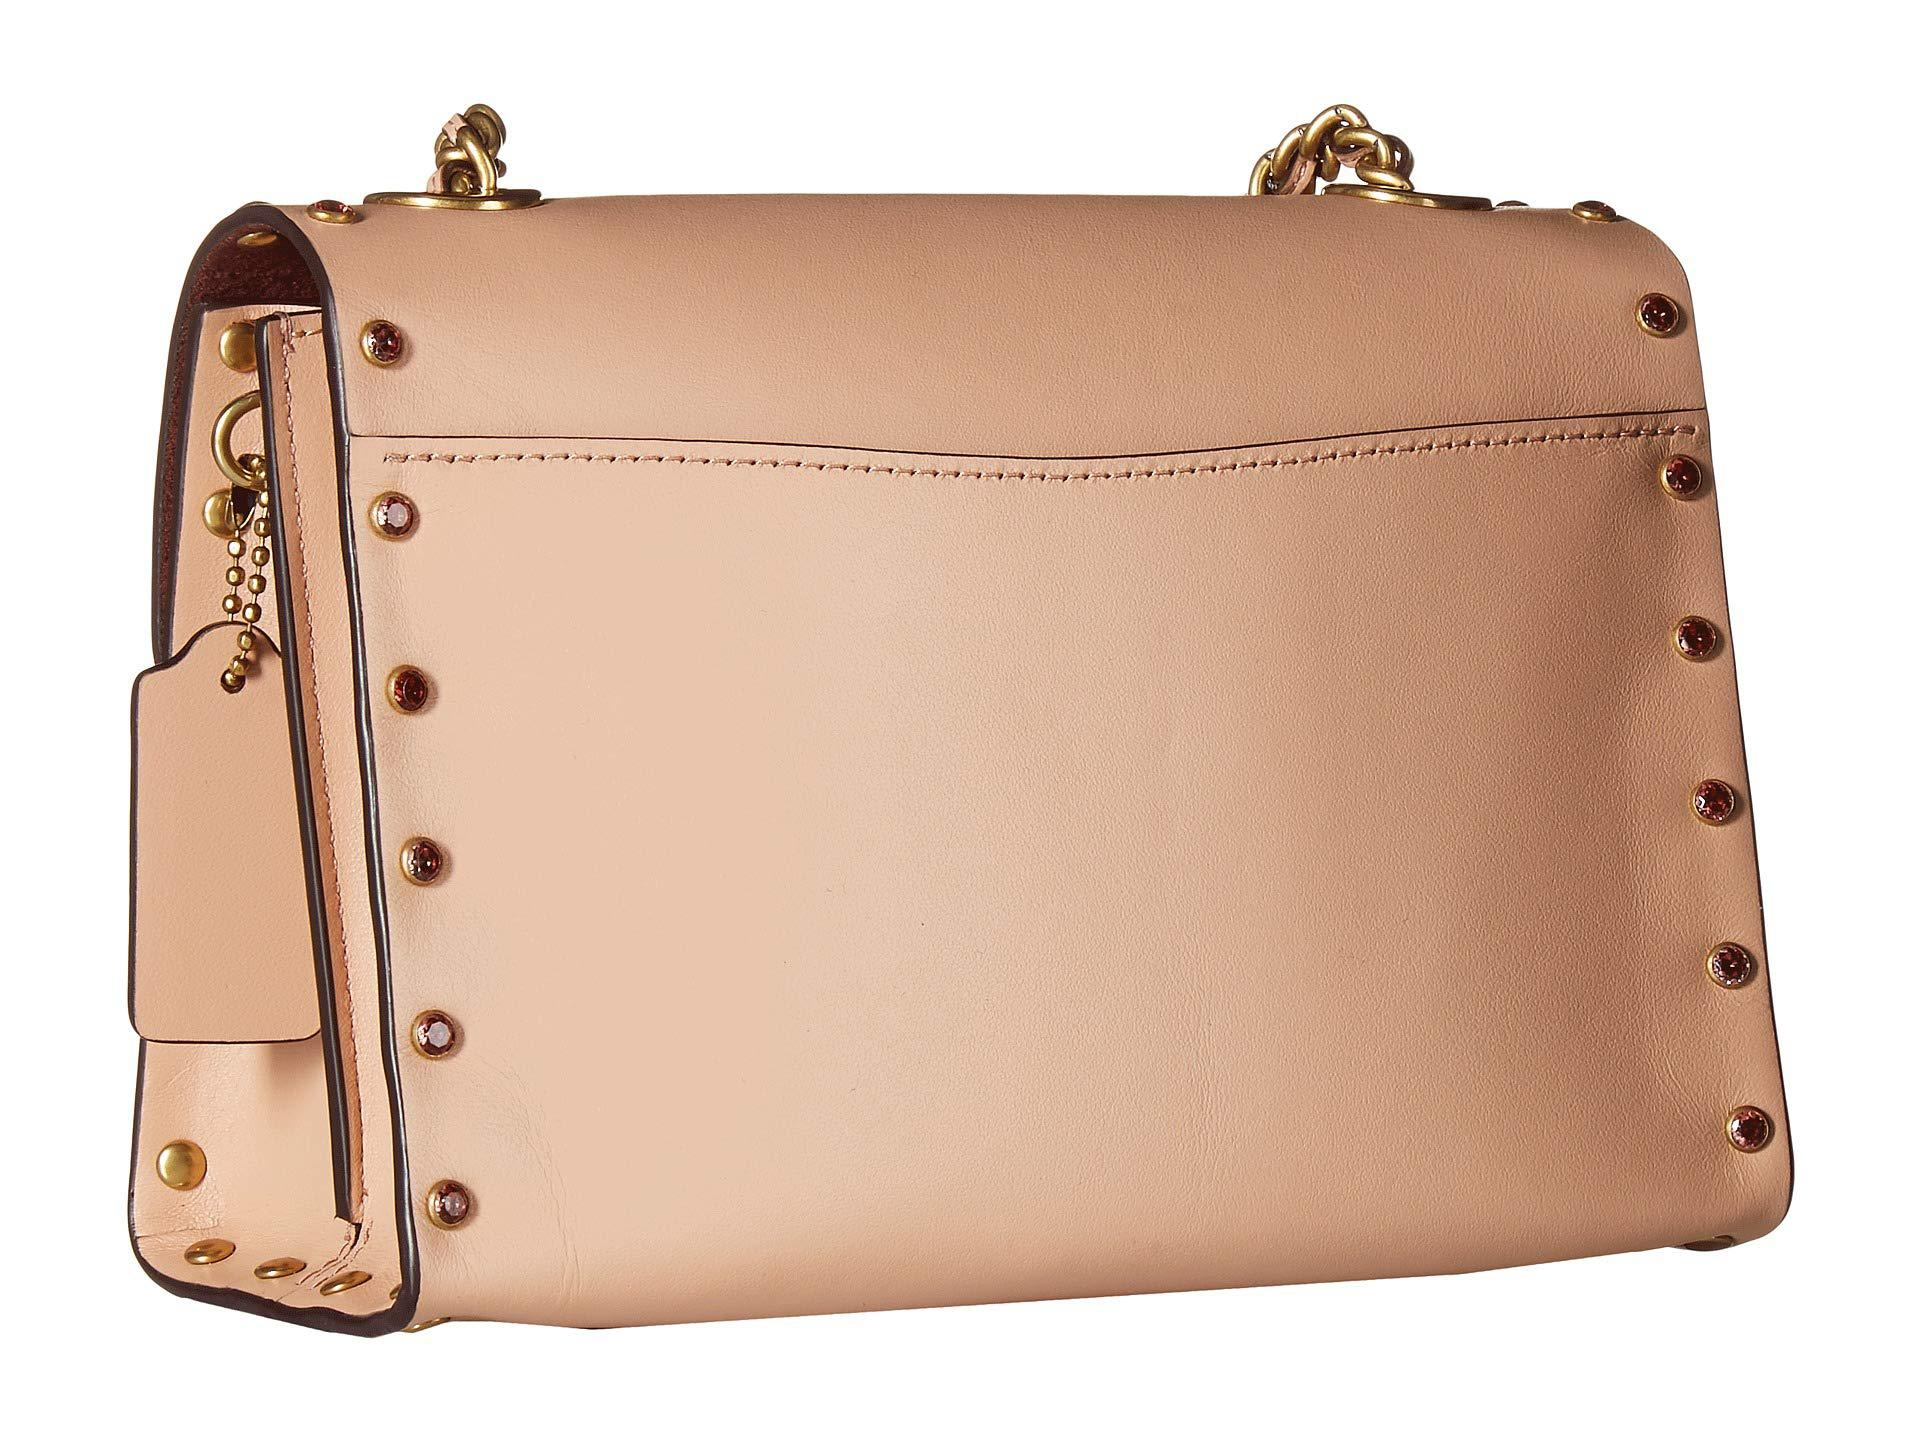 62912b463541 coach-B4Nude-Pink-Crystal-Border-Rivets-Parker-18-Shoulder-Bag-b4nude-Pink-Shoulder-Handbags.jpeg